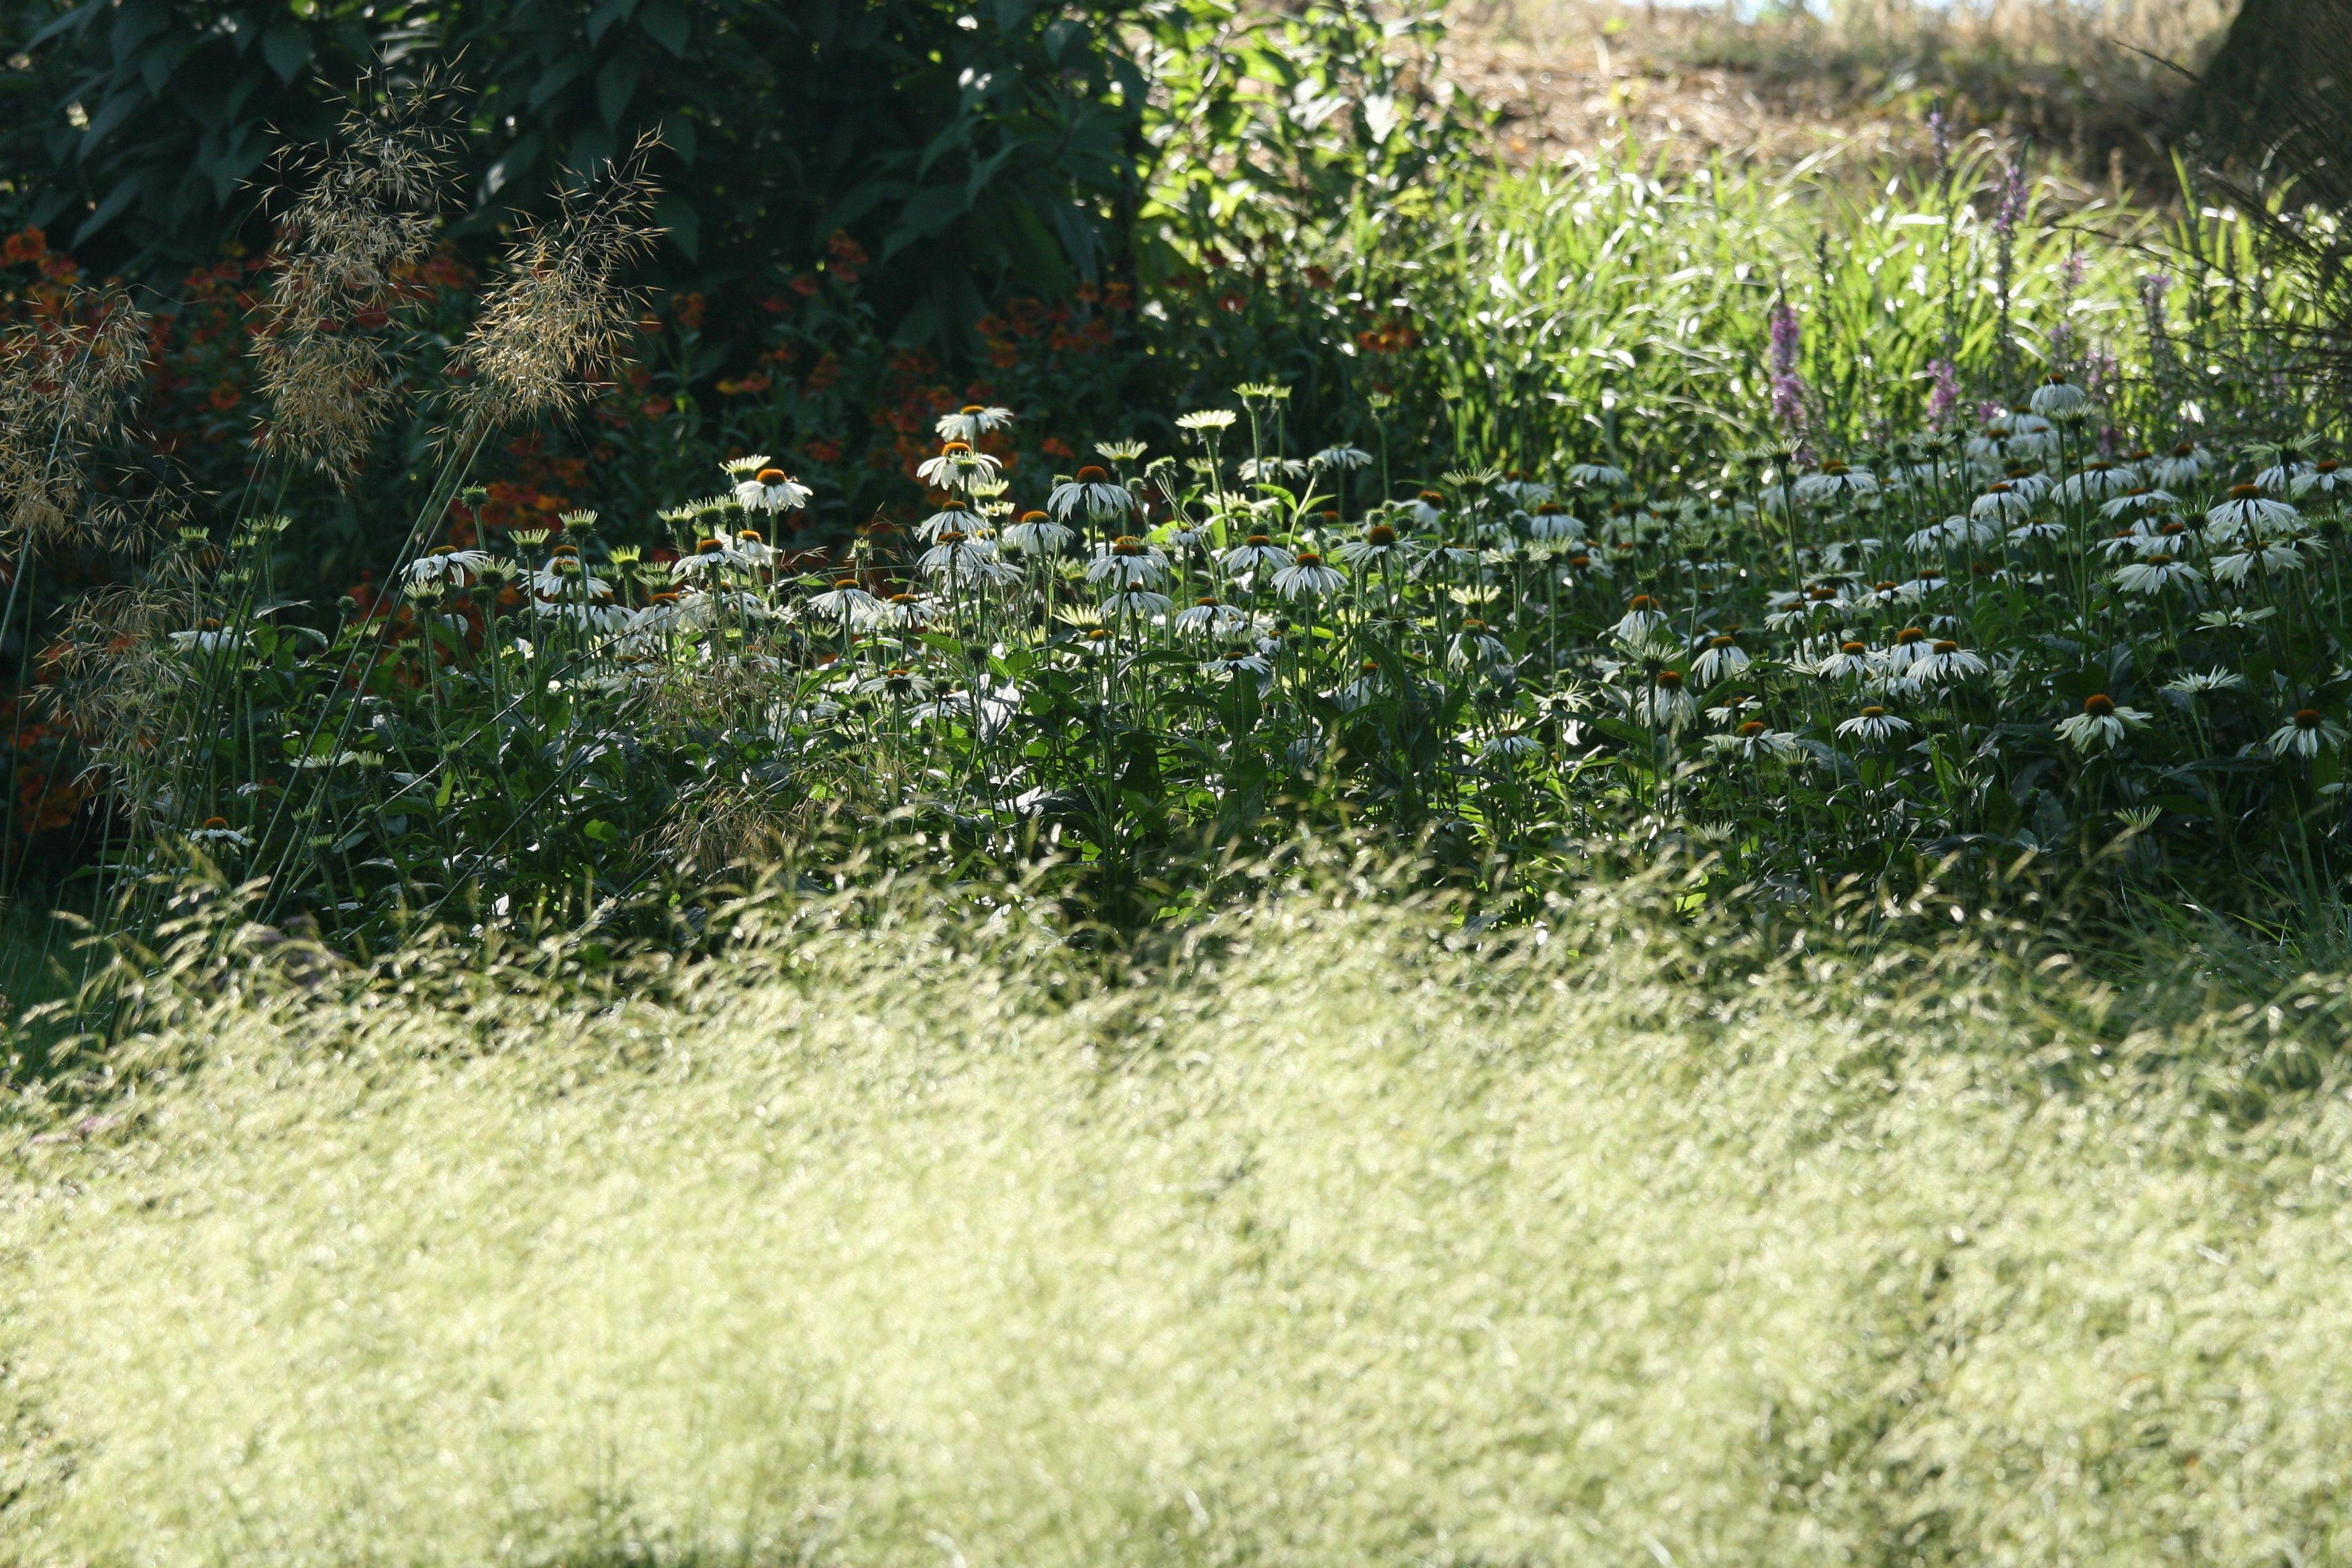 Naturalistic Planting Using Grasses